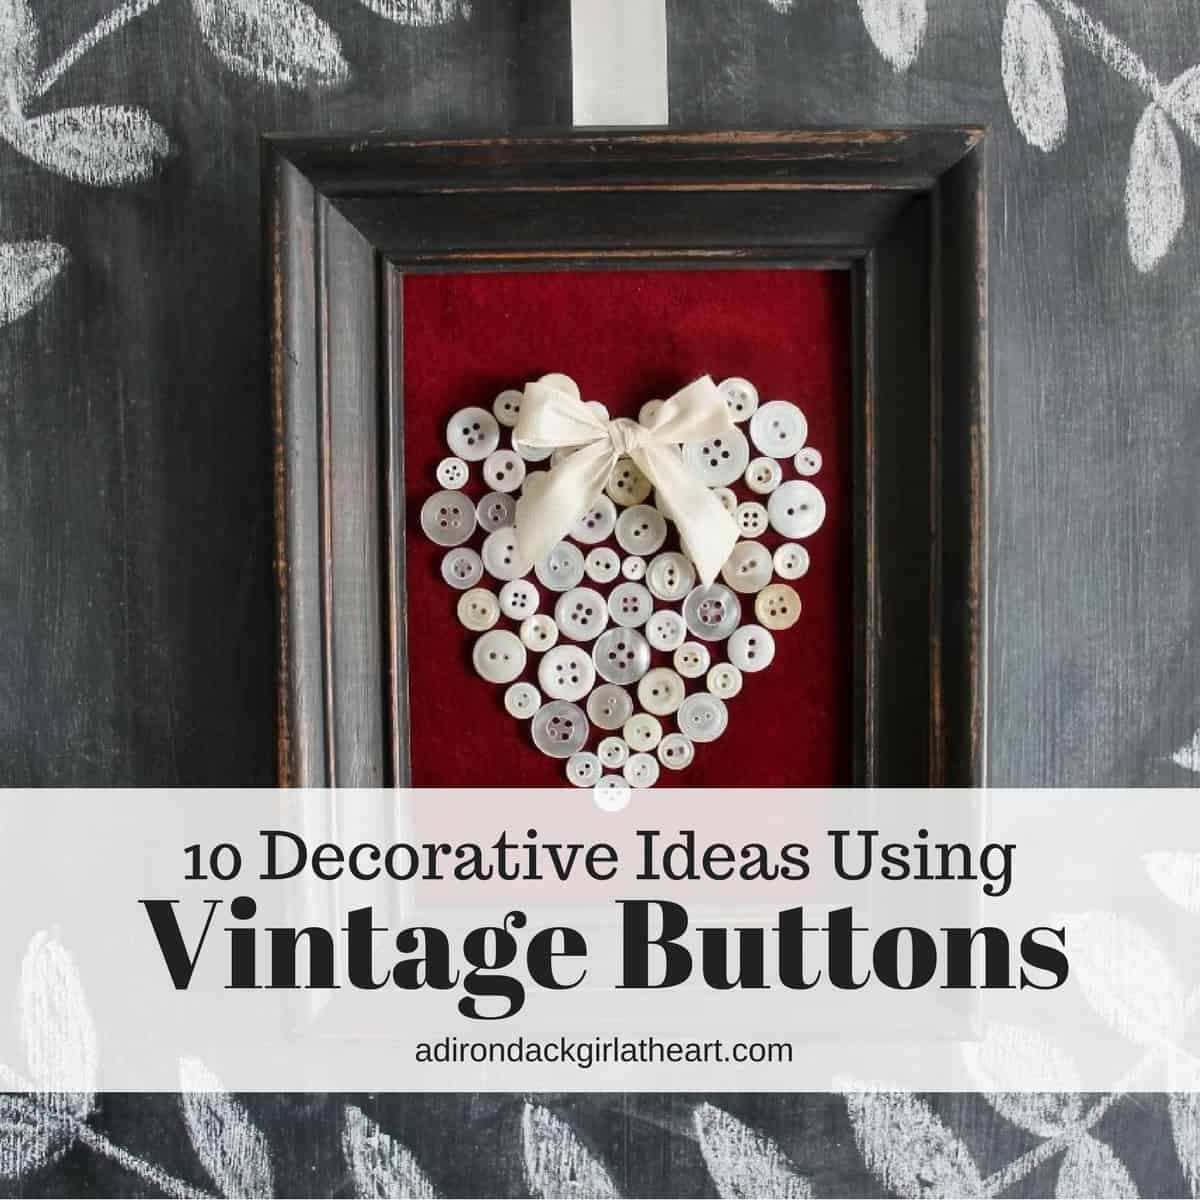 10 Decorative Ideas Using Vintage Buttons • Adirondack